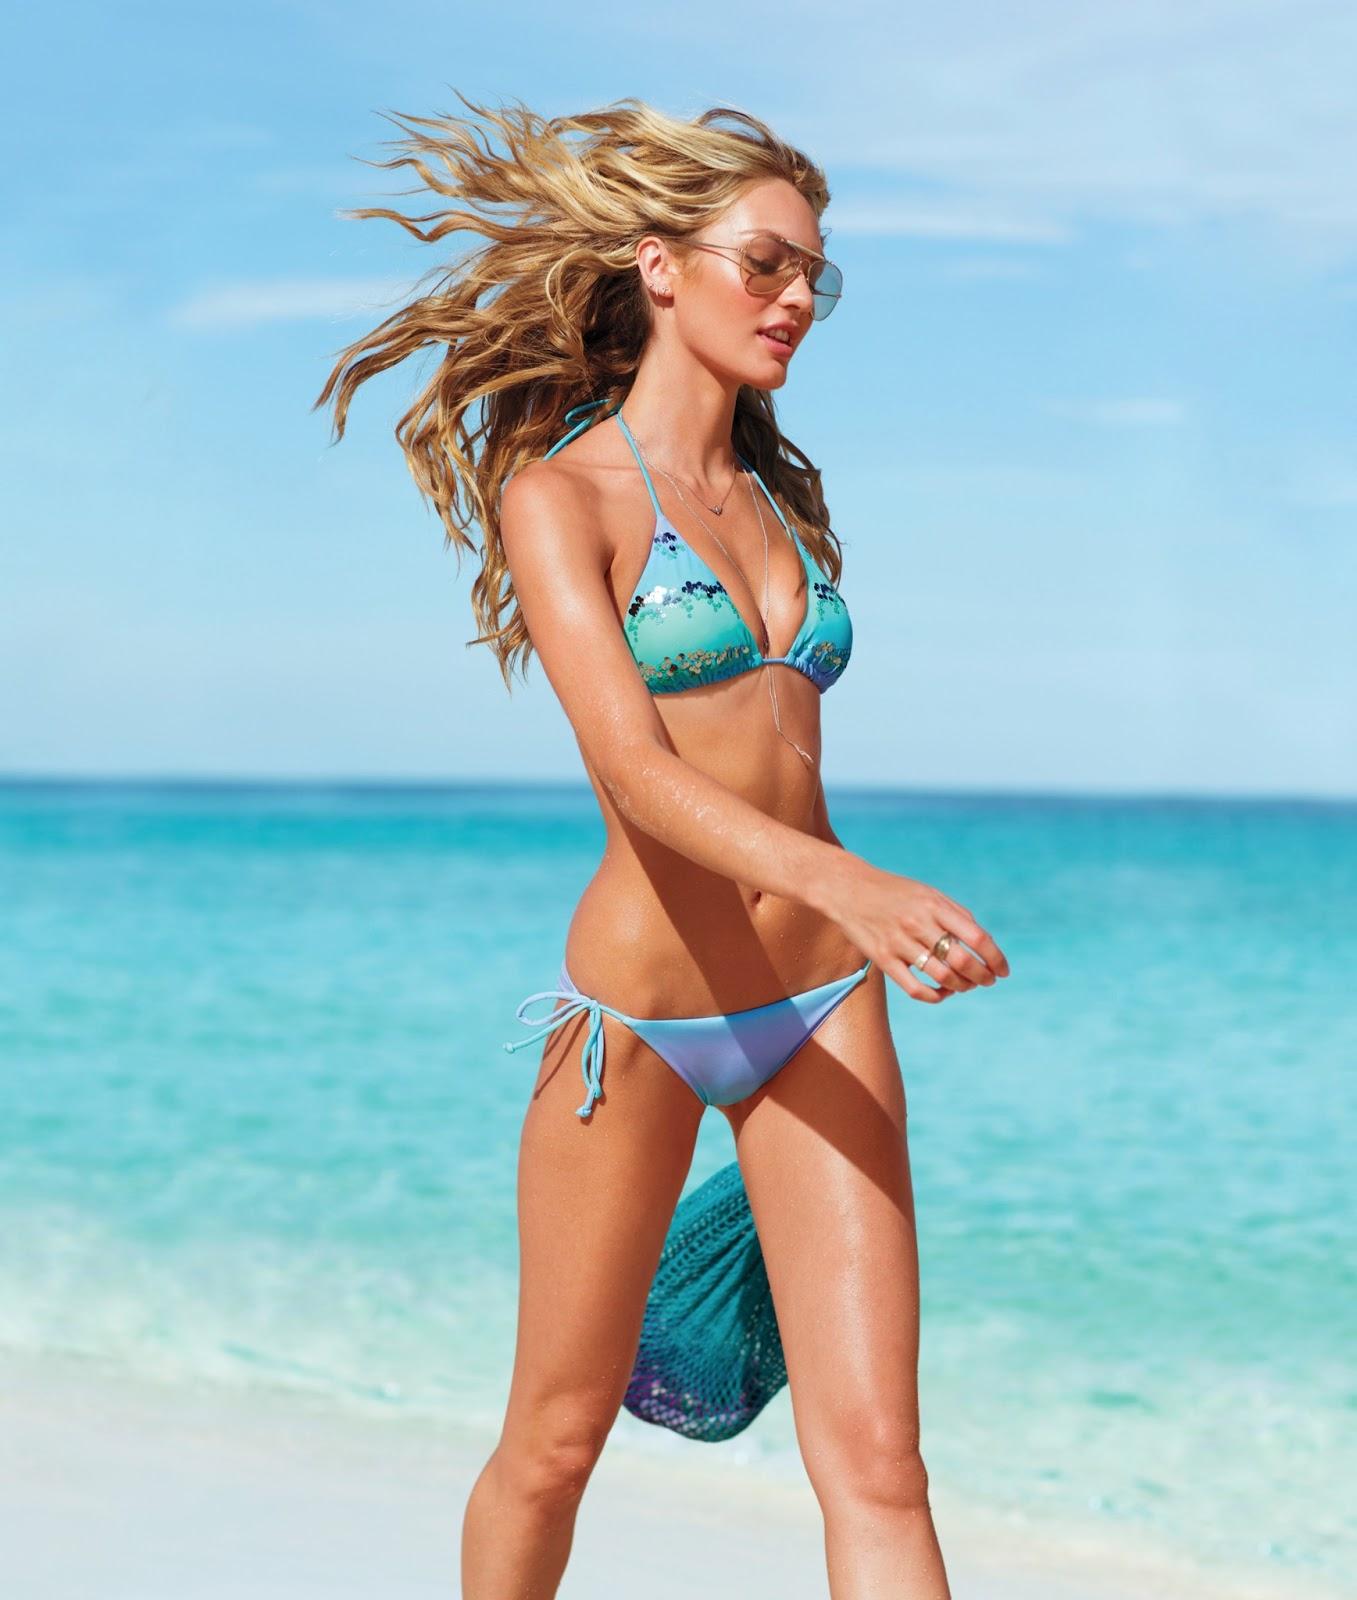 http://1.bp.blogspot.com/-3lySmFJwQpc/UOgWRMhs-vI/AAAAAAAAGJY/0LAAG8wrtP4/s1600/swim-2013-candice-swanepoel-beach-sexy-triangle-top-bikini-victorias-secret-hi-res.jpg